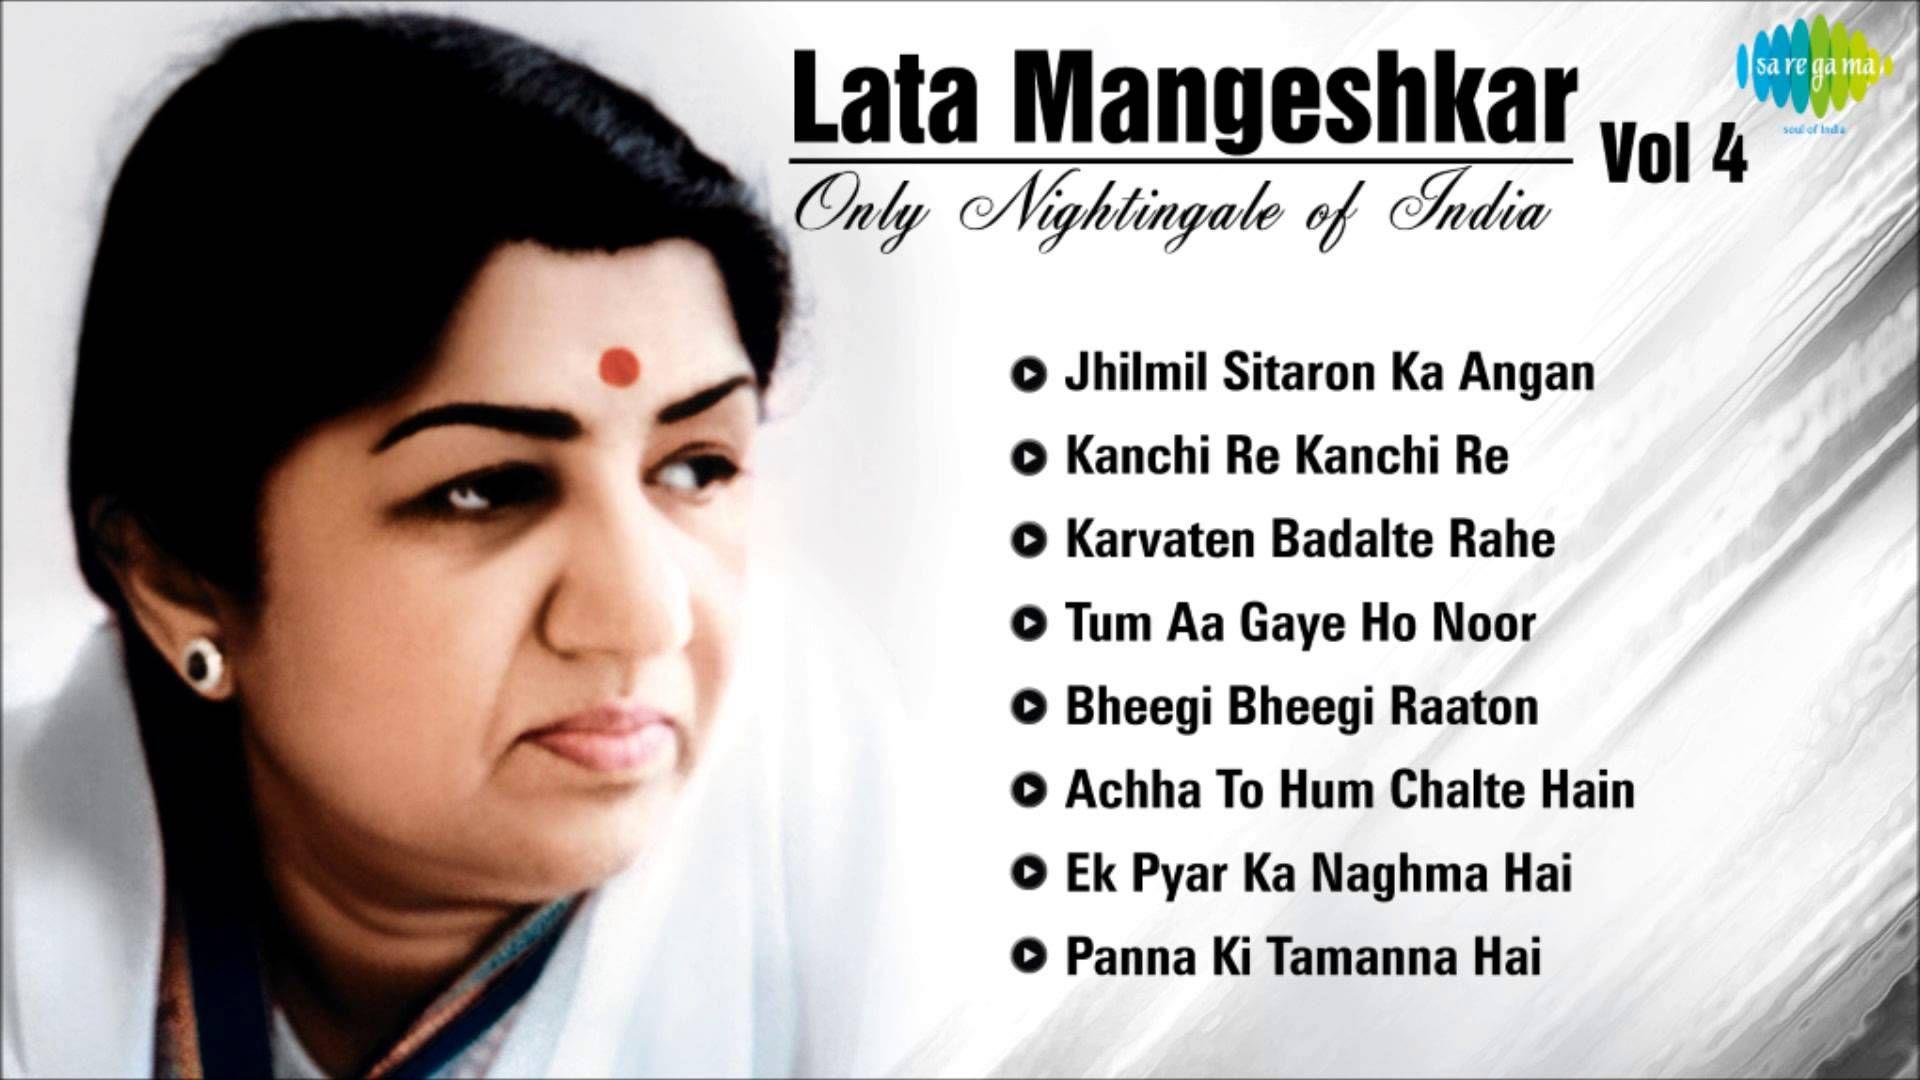 Best of Lata Mangeshkar - Old Hindi Songs - Superhit